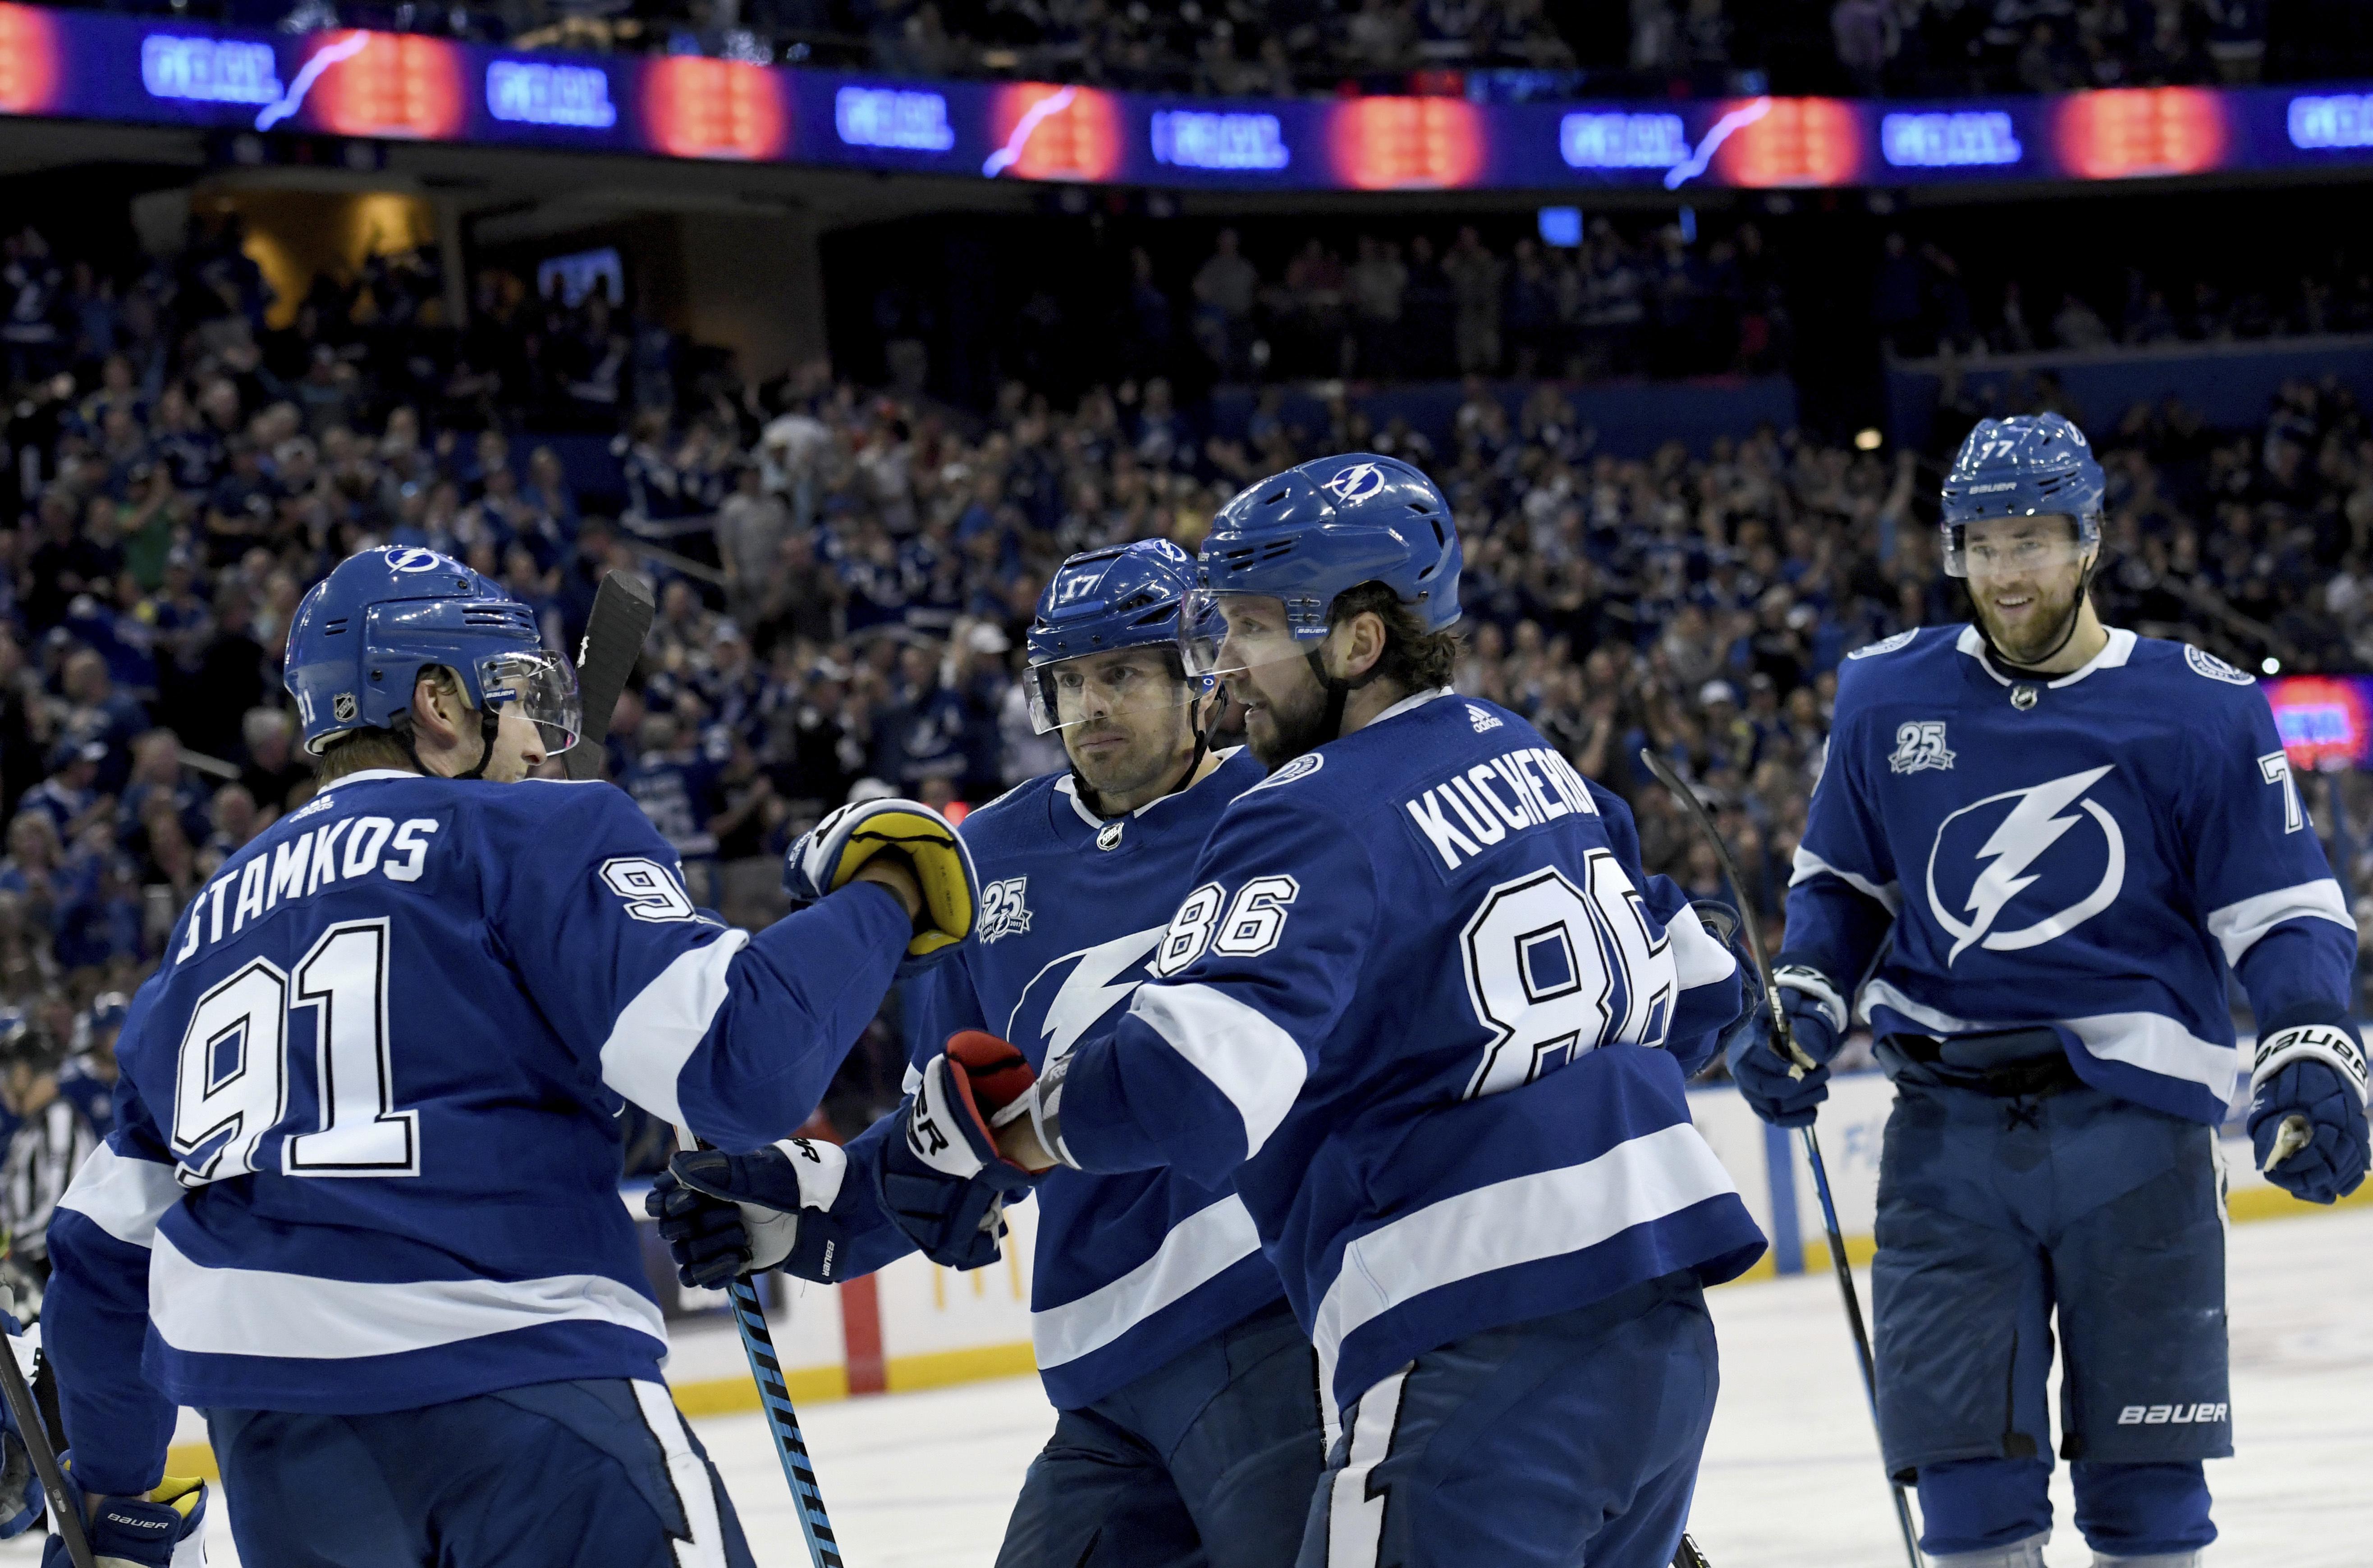 Oilers_lightning_hockey_32035